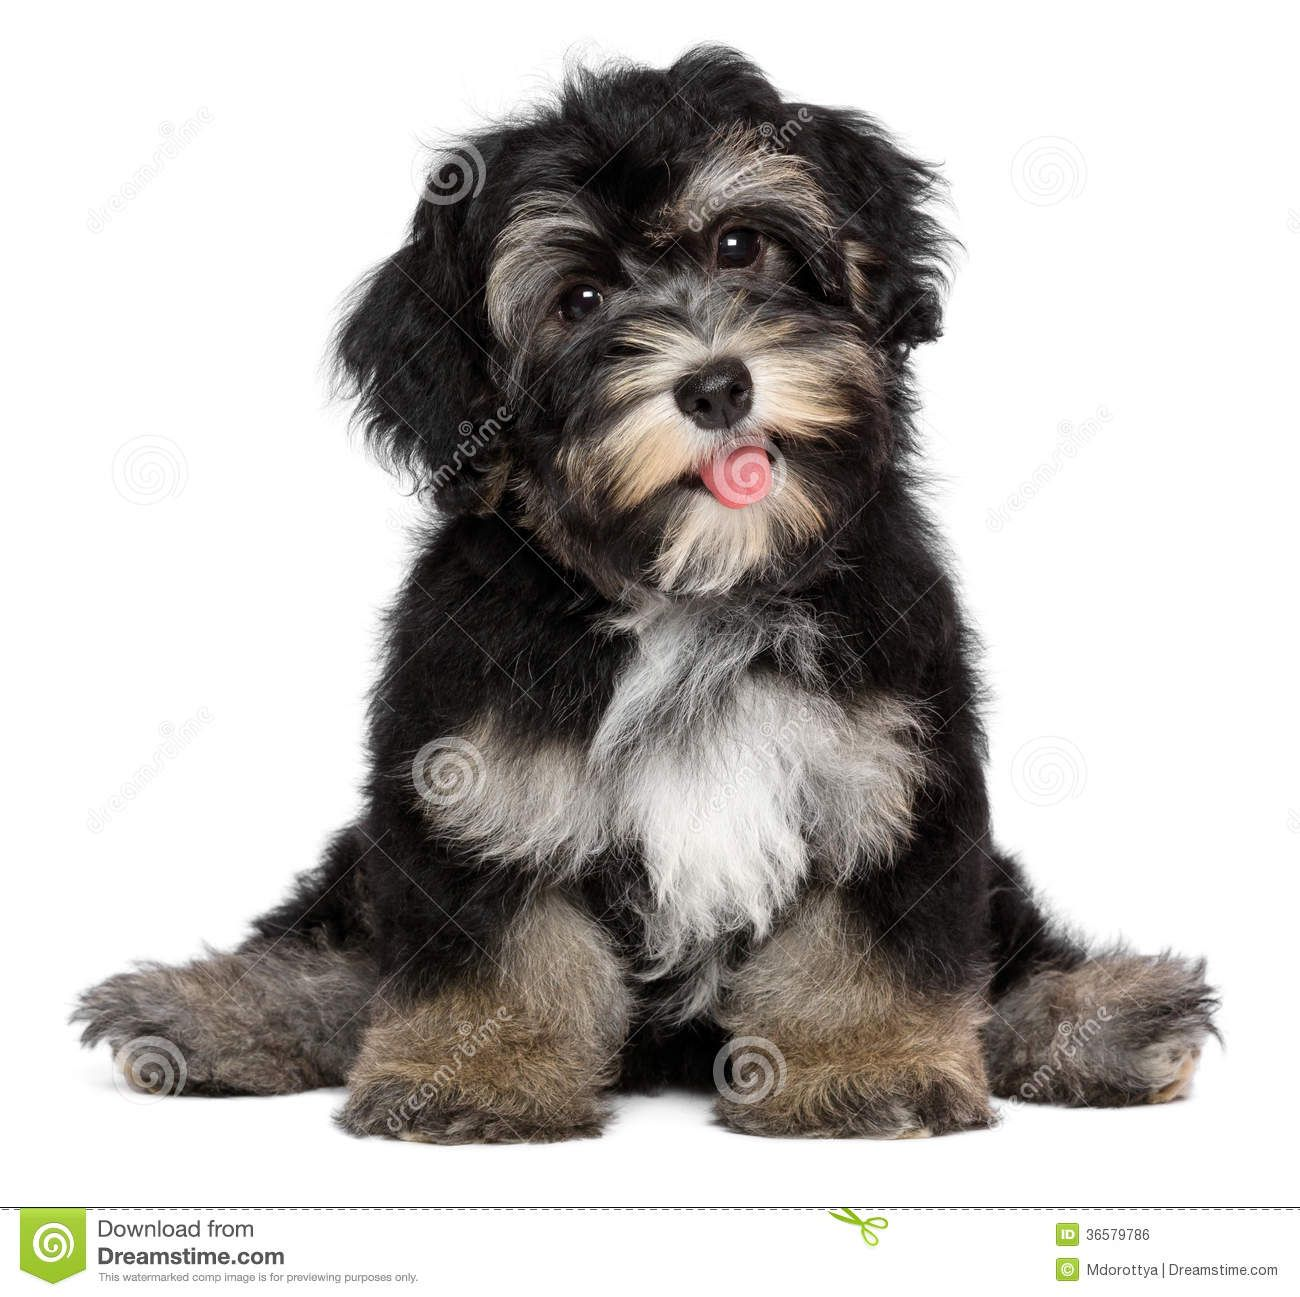 Pin by Kris Morris on Wesley Short dog, Tallest dog, Westies